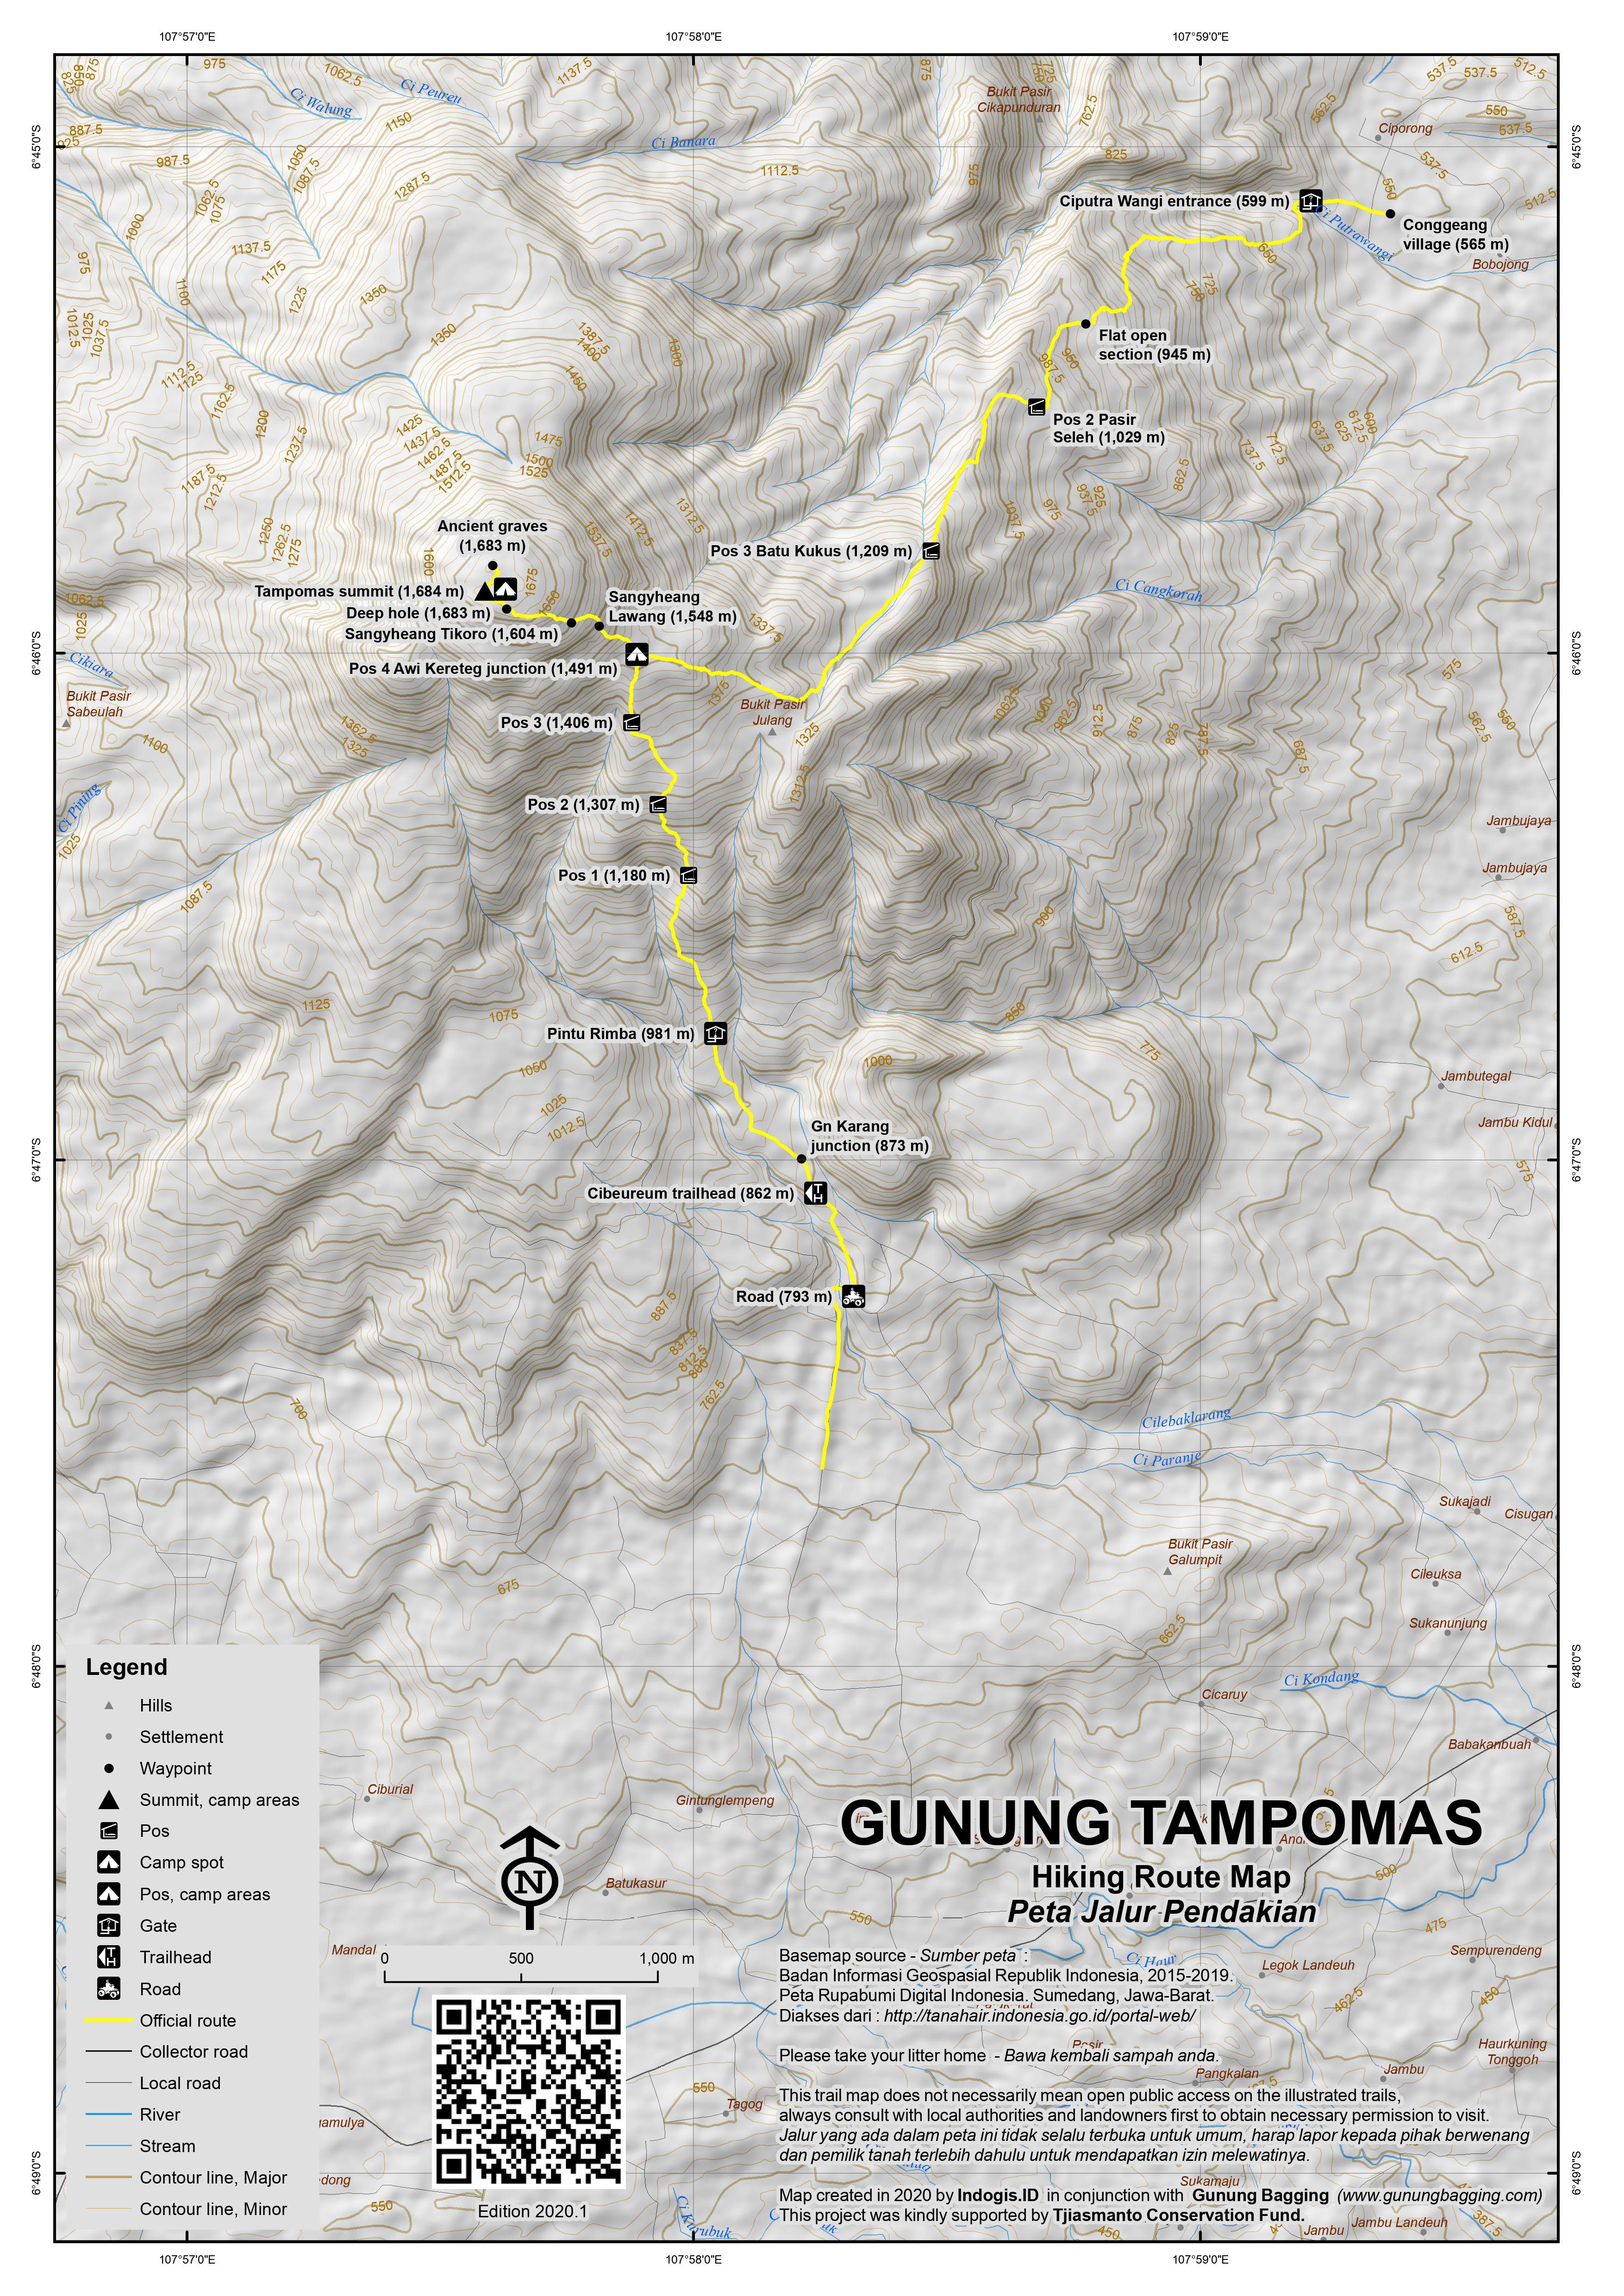 Peta Jalur Pendakian Gunung Tampomas